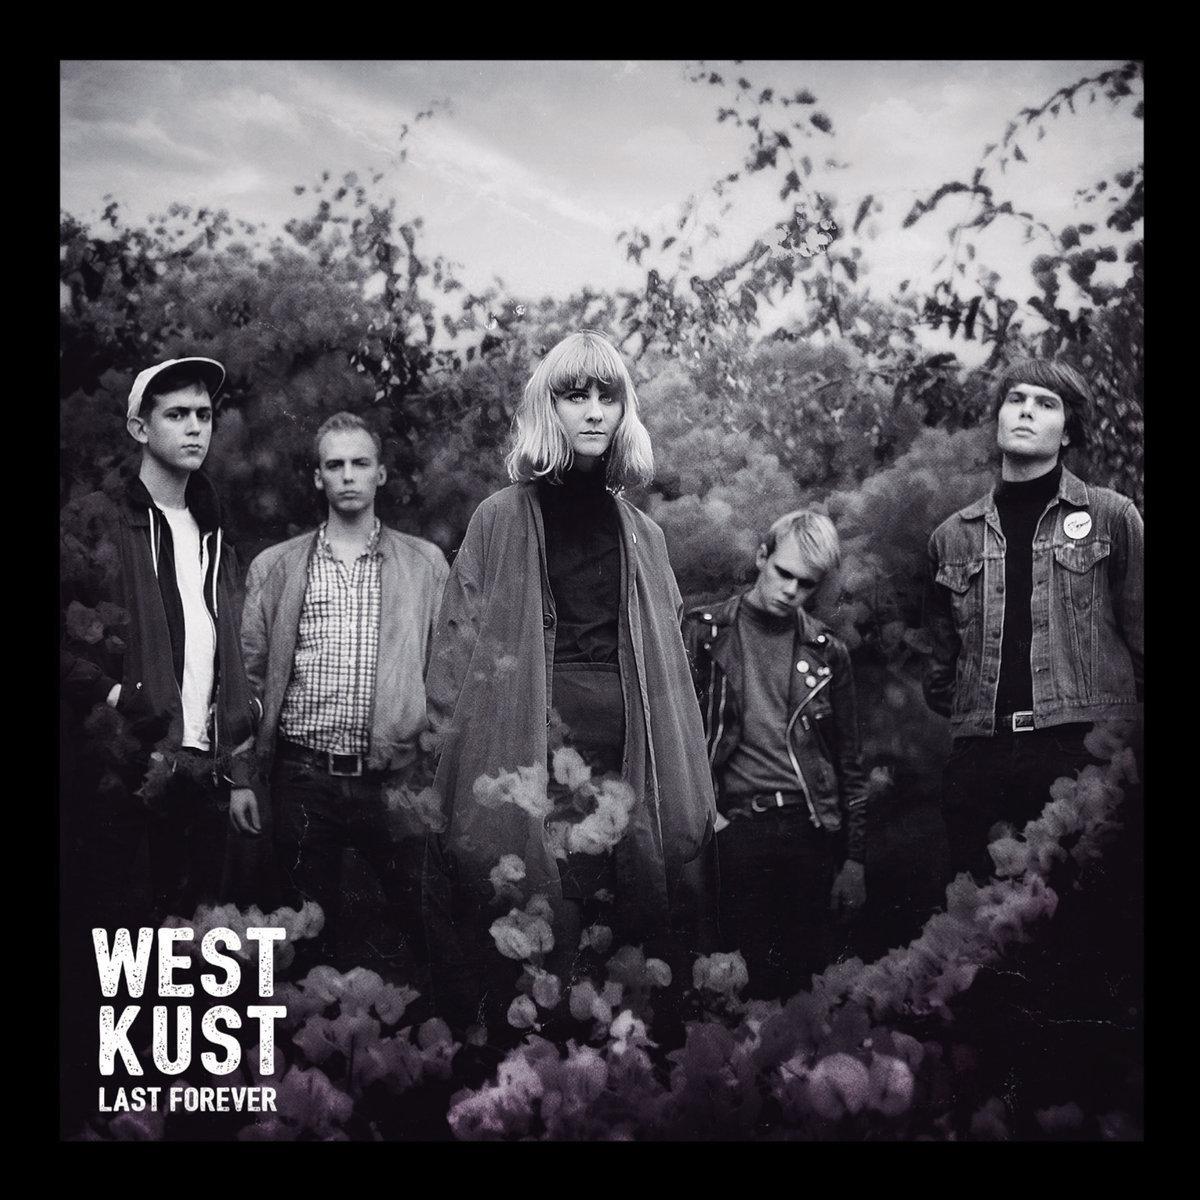 Jonna Westkust Luxury Records